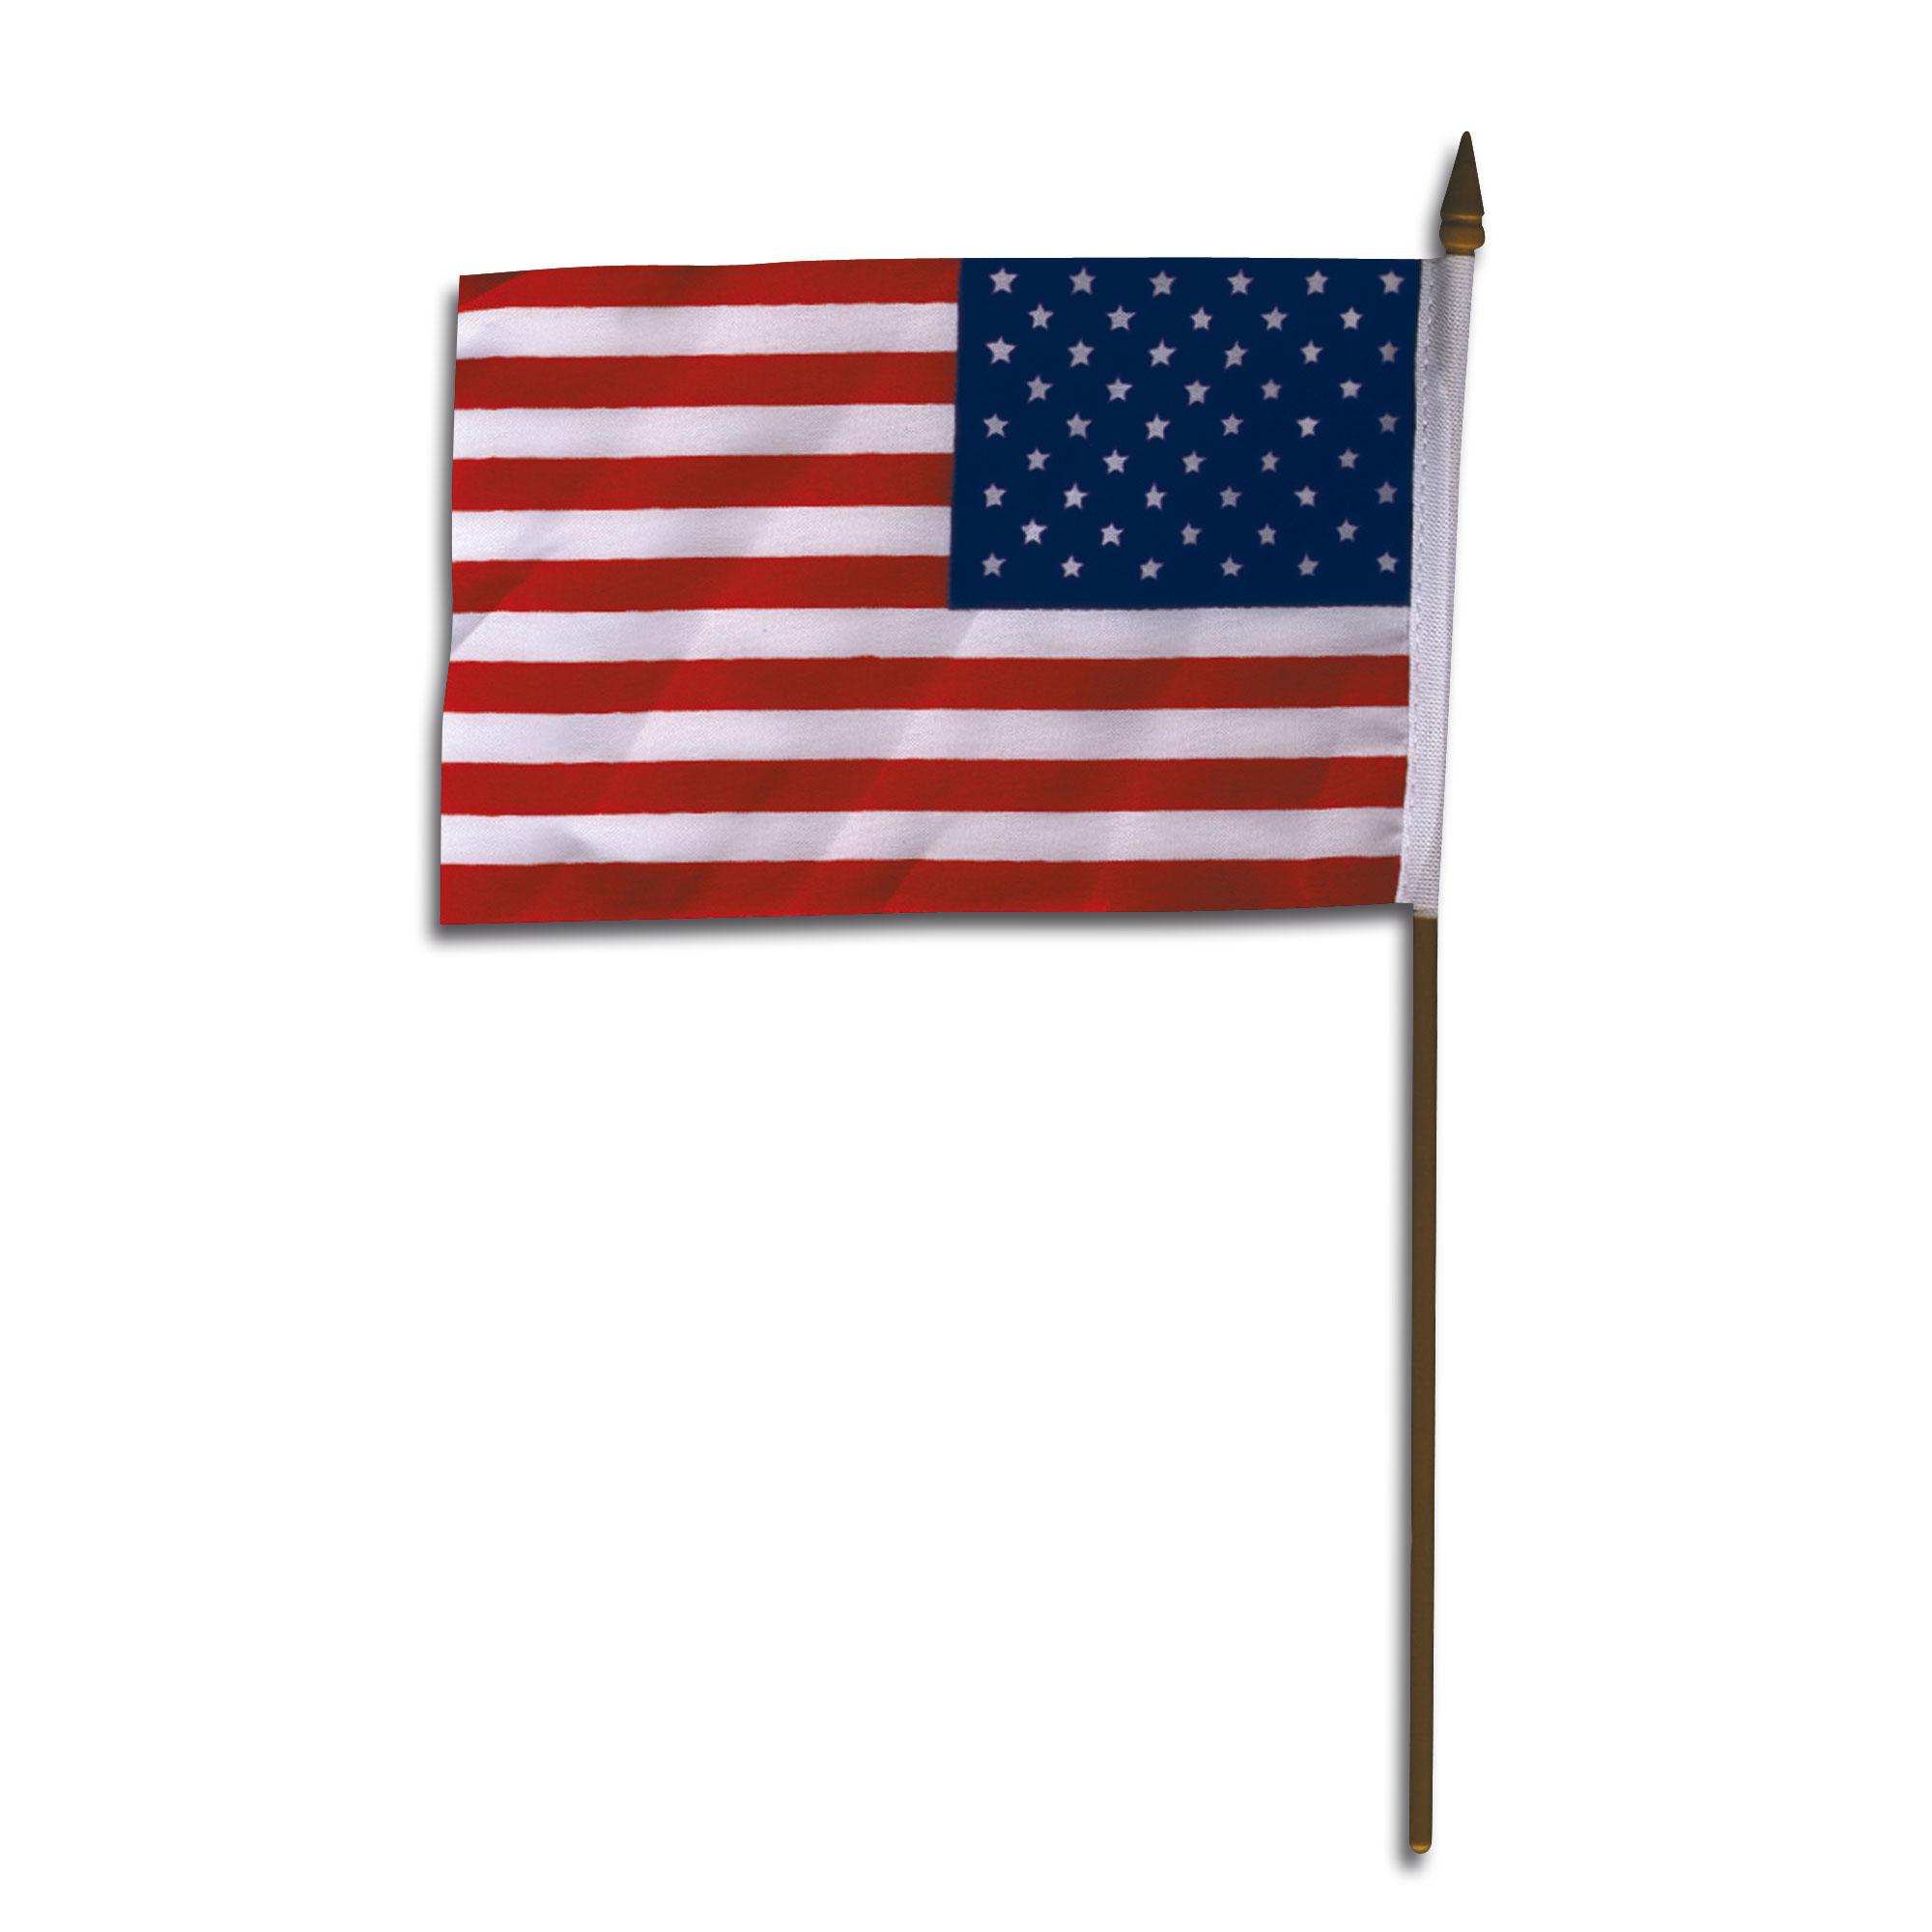 Mini-bandera de mano USA